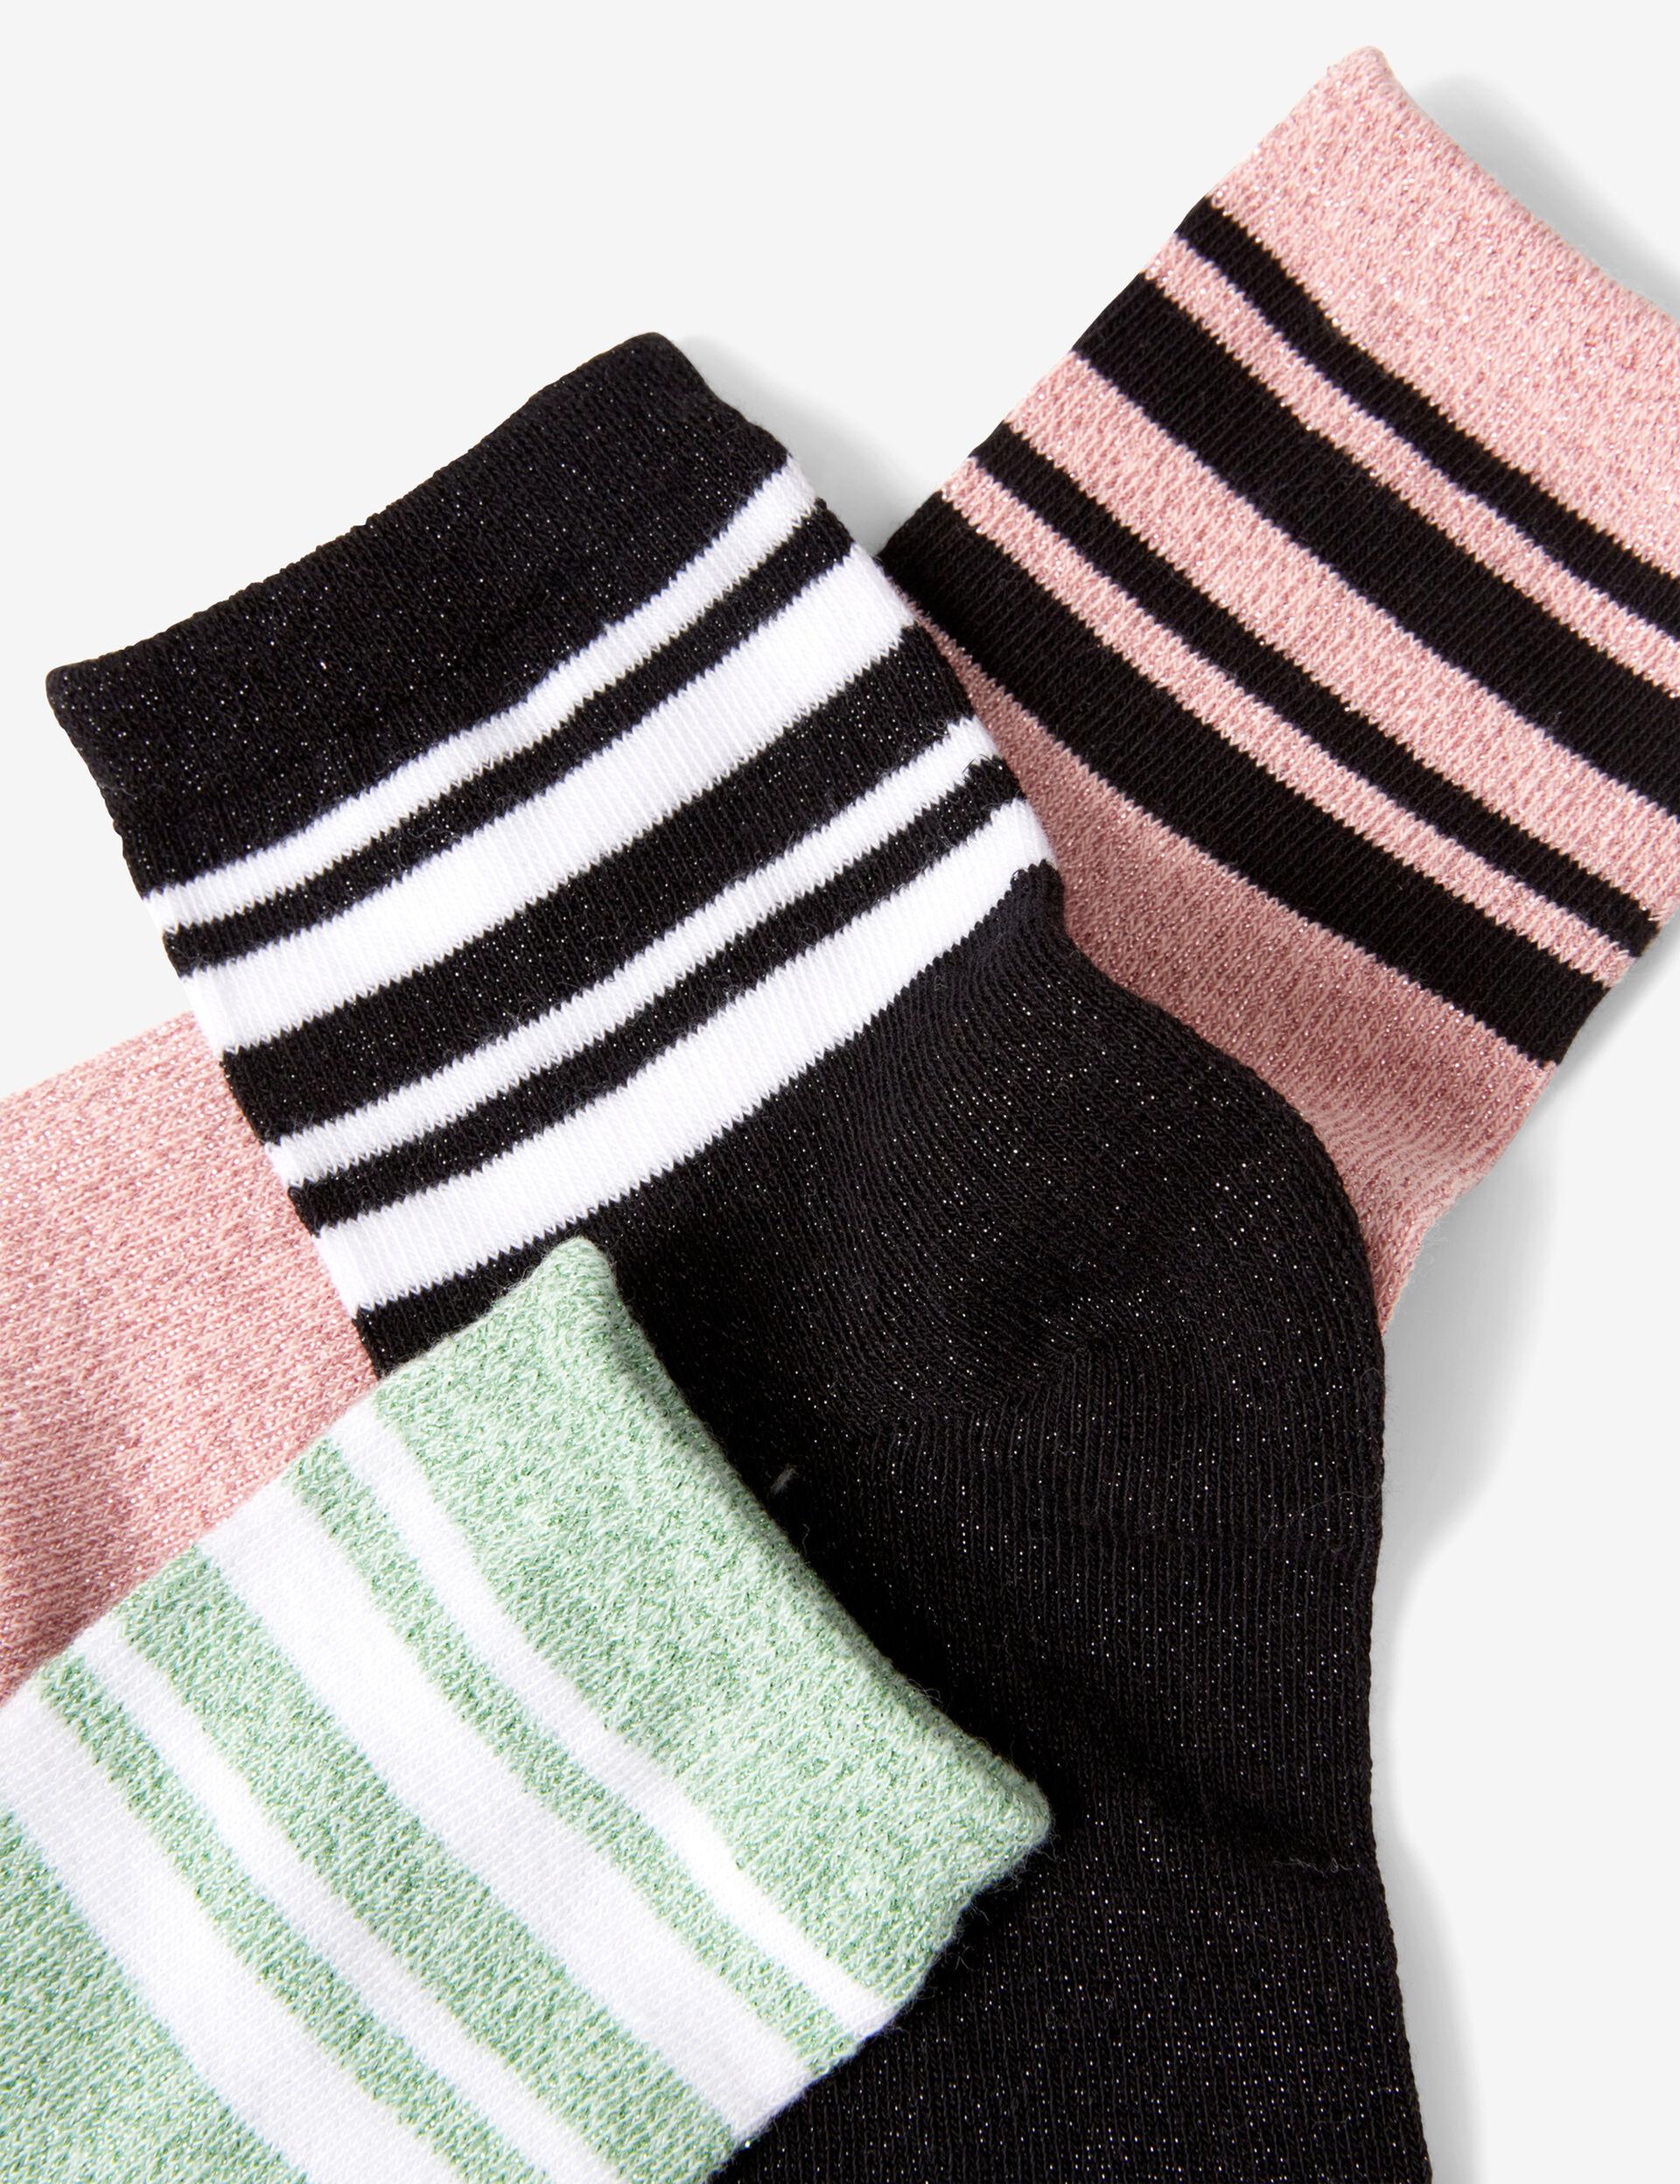 Sparkly socks